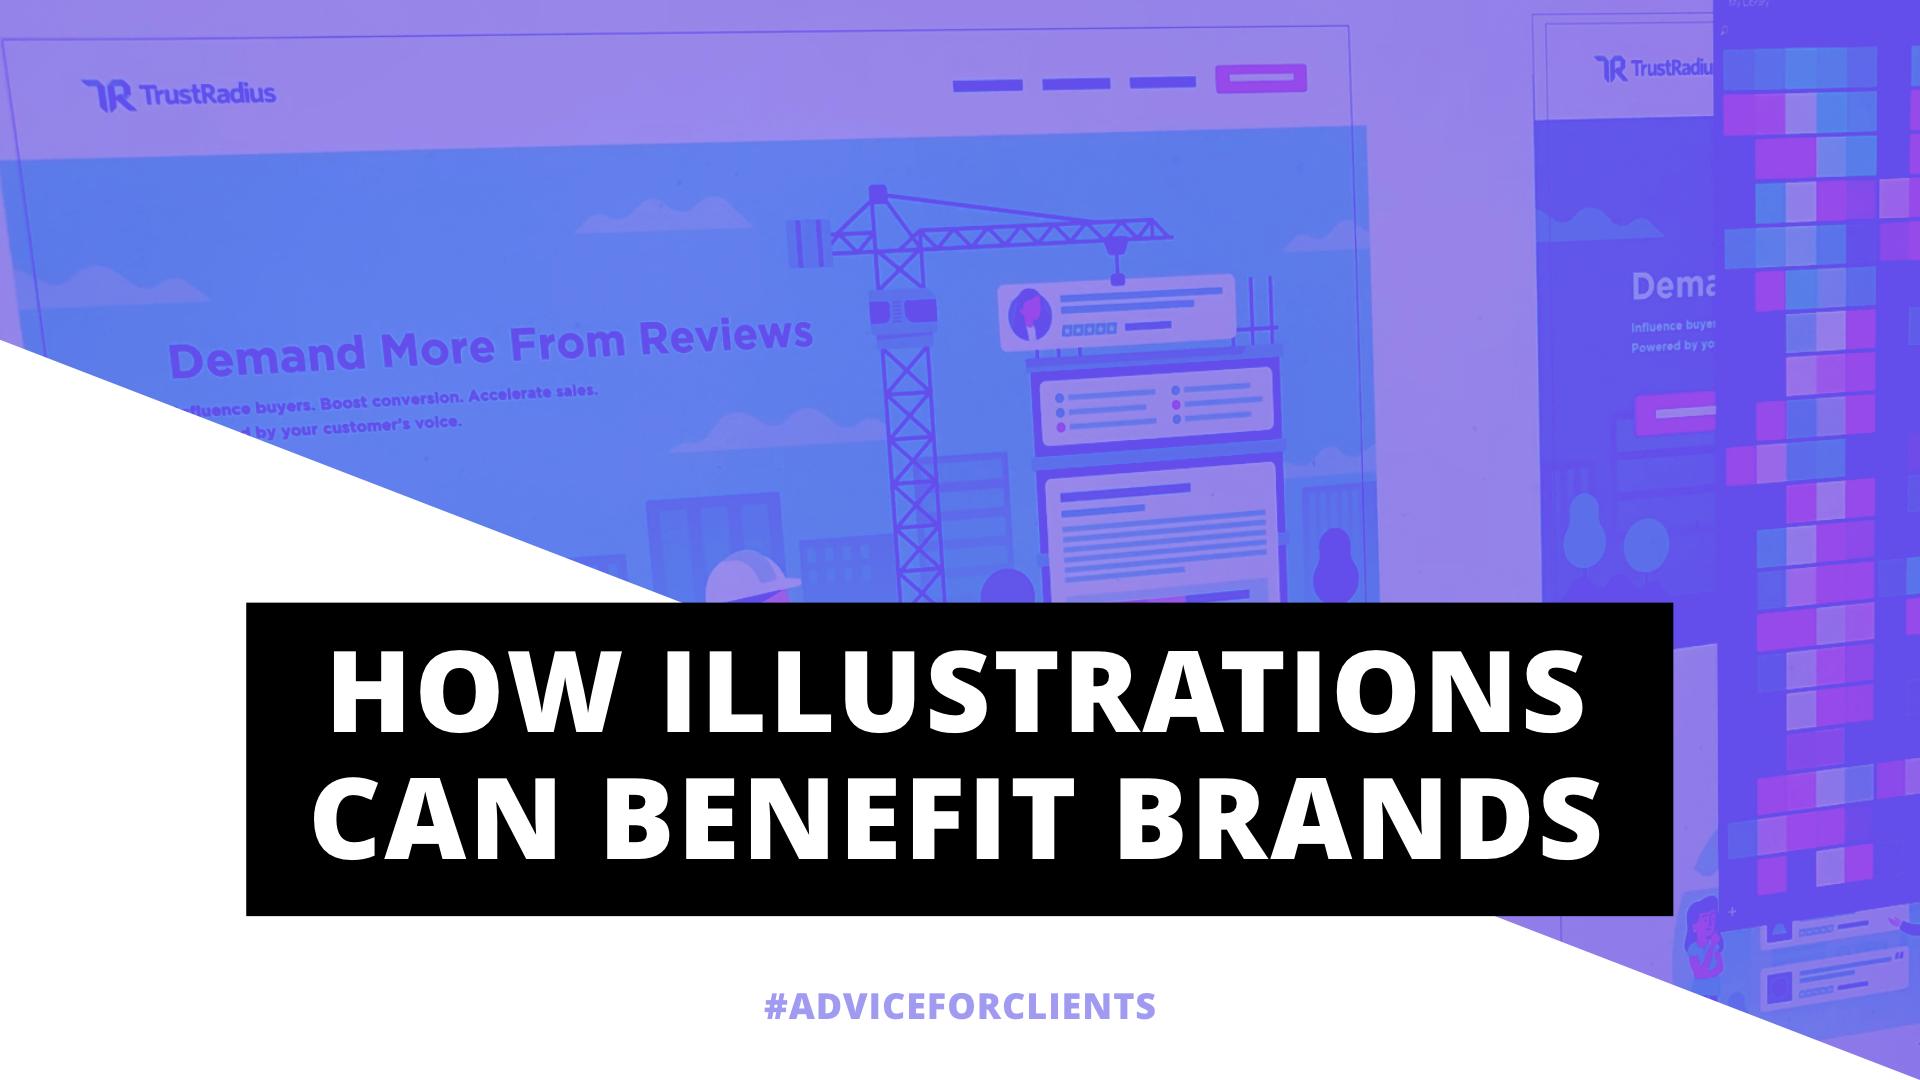 RockyRoark_Header_How-Illustrations-Can-Benefit-Brands.png